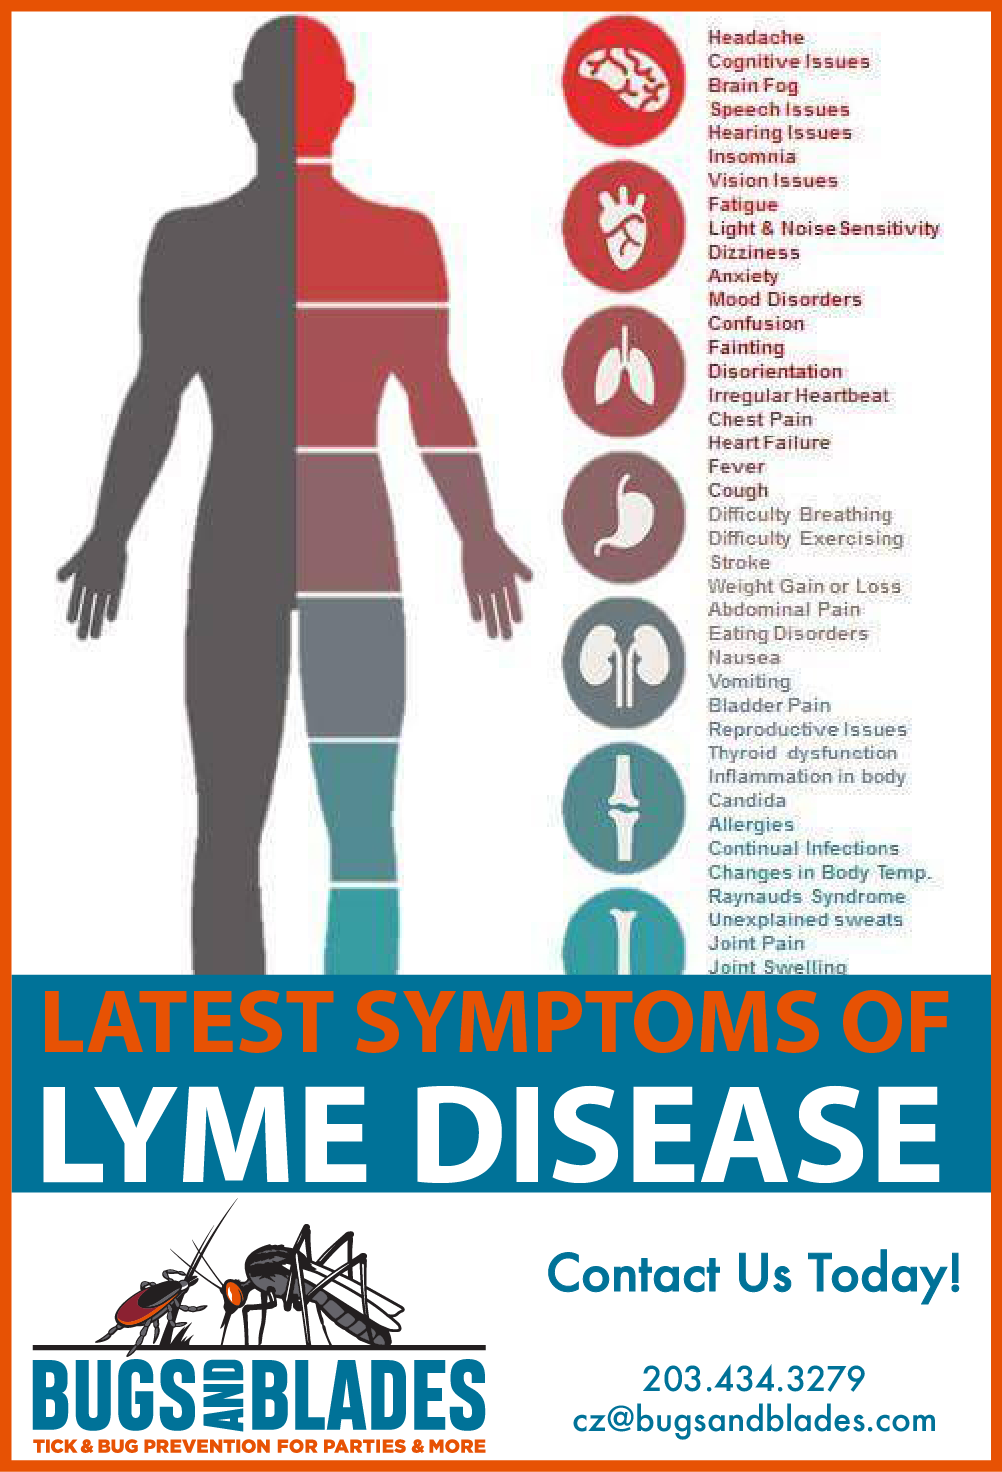 Latest Symptoms of LYME DISEASE